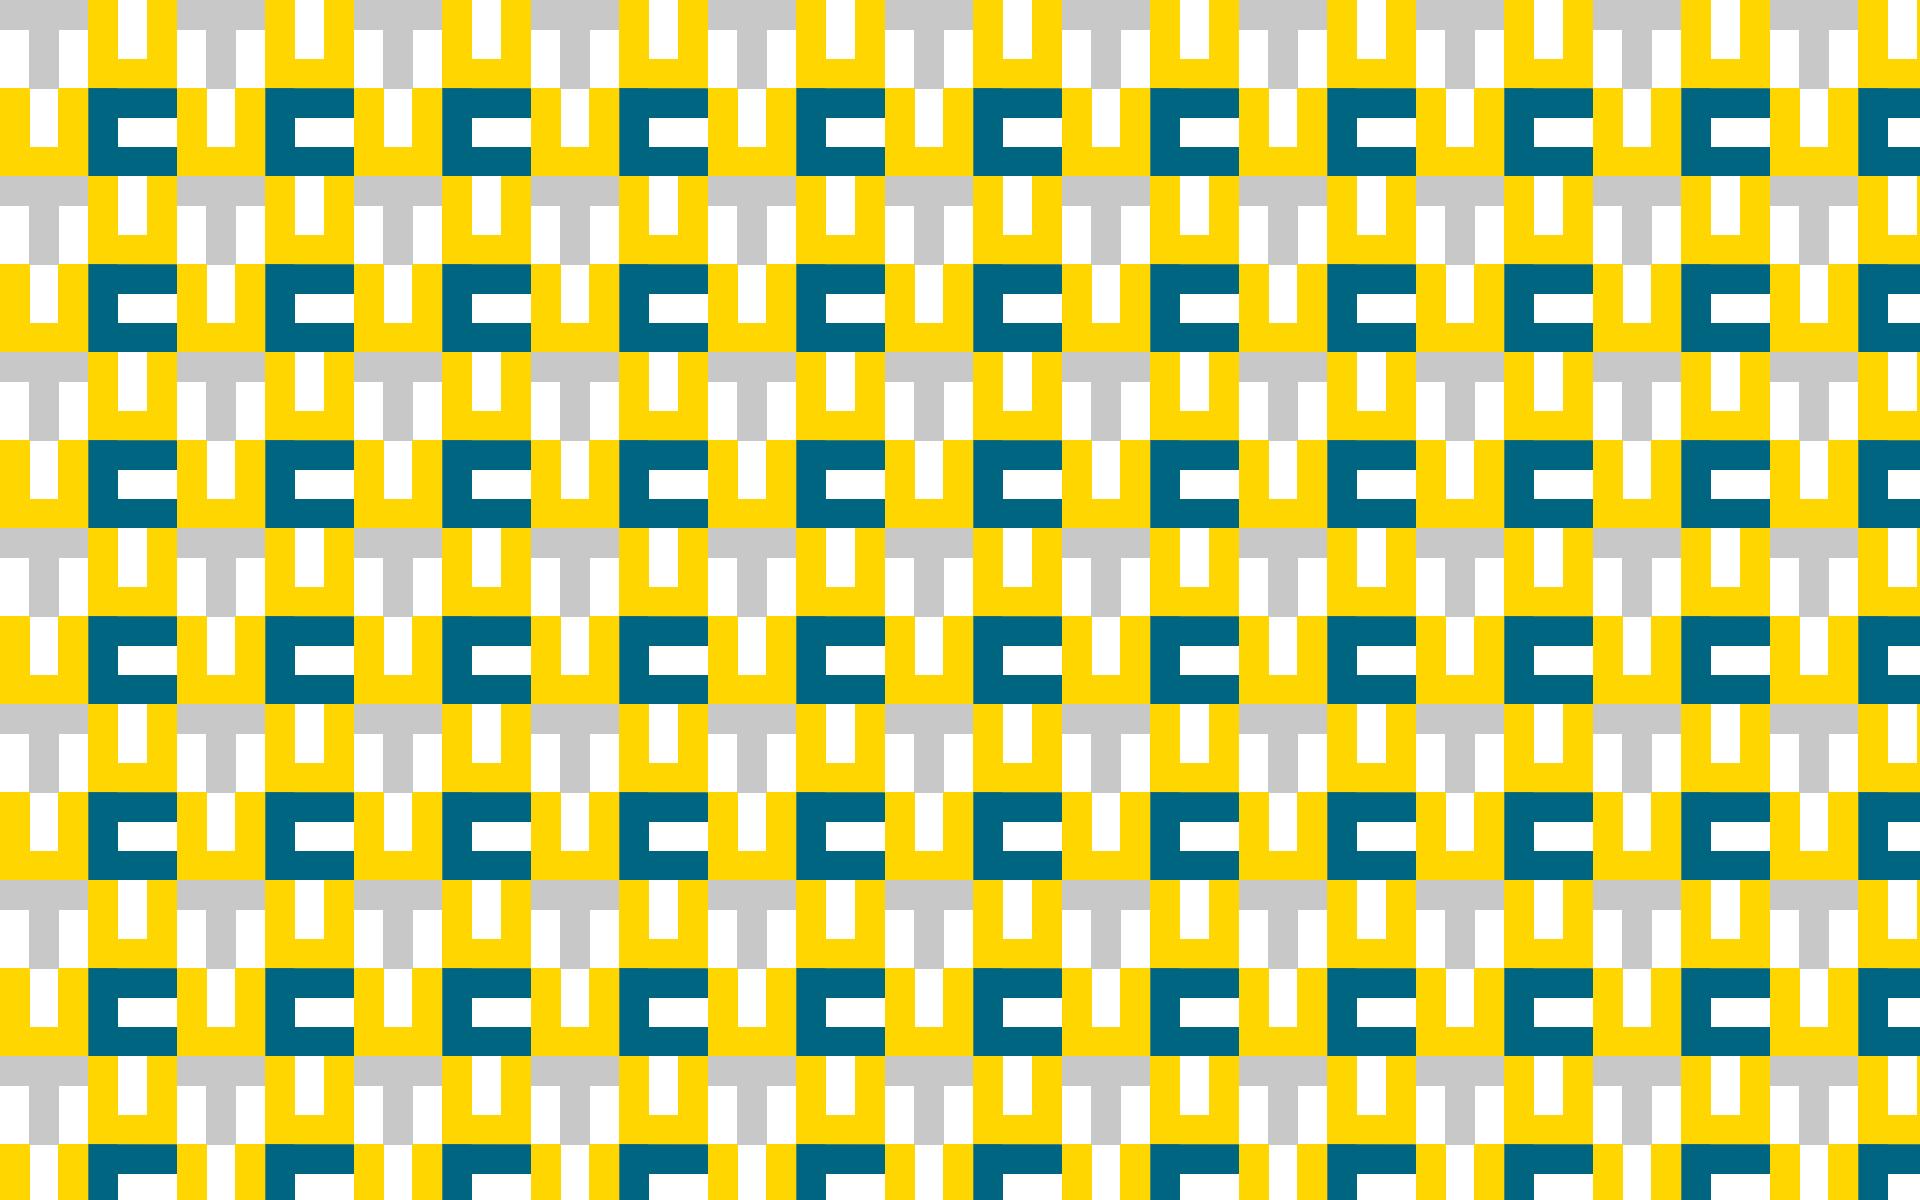 TUC Brutal Yellow